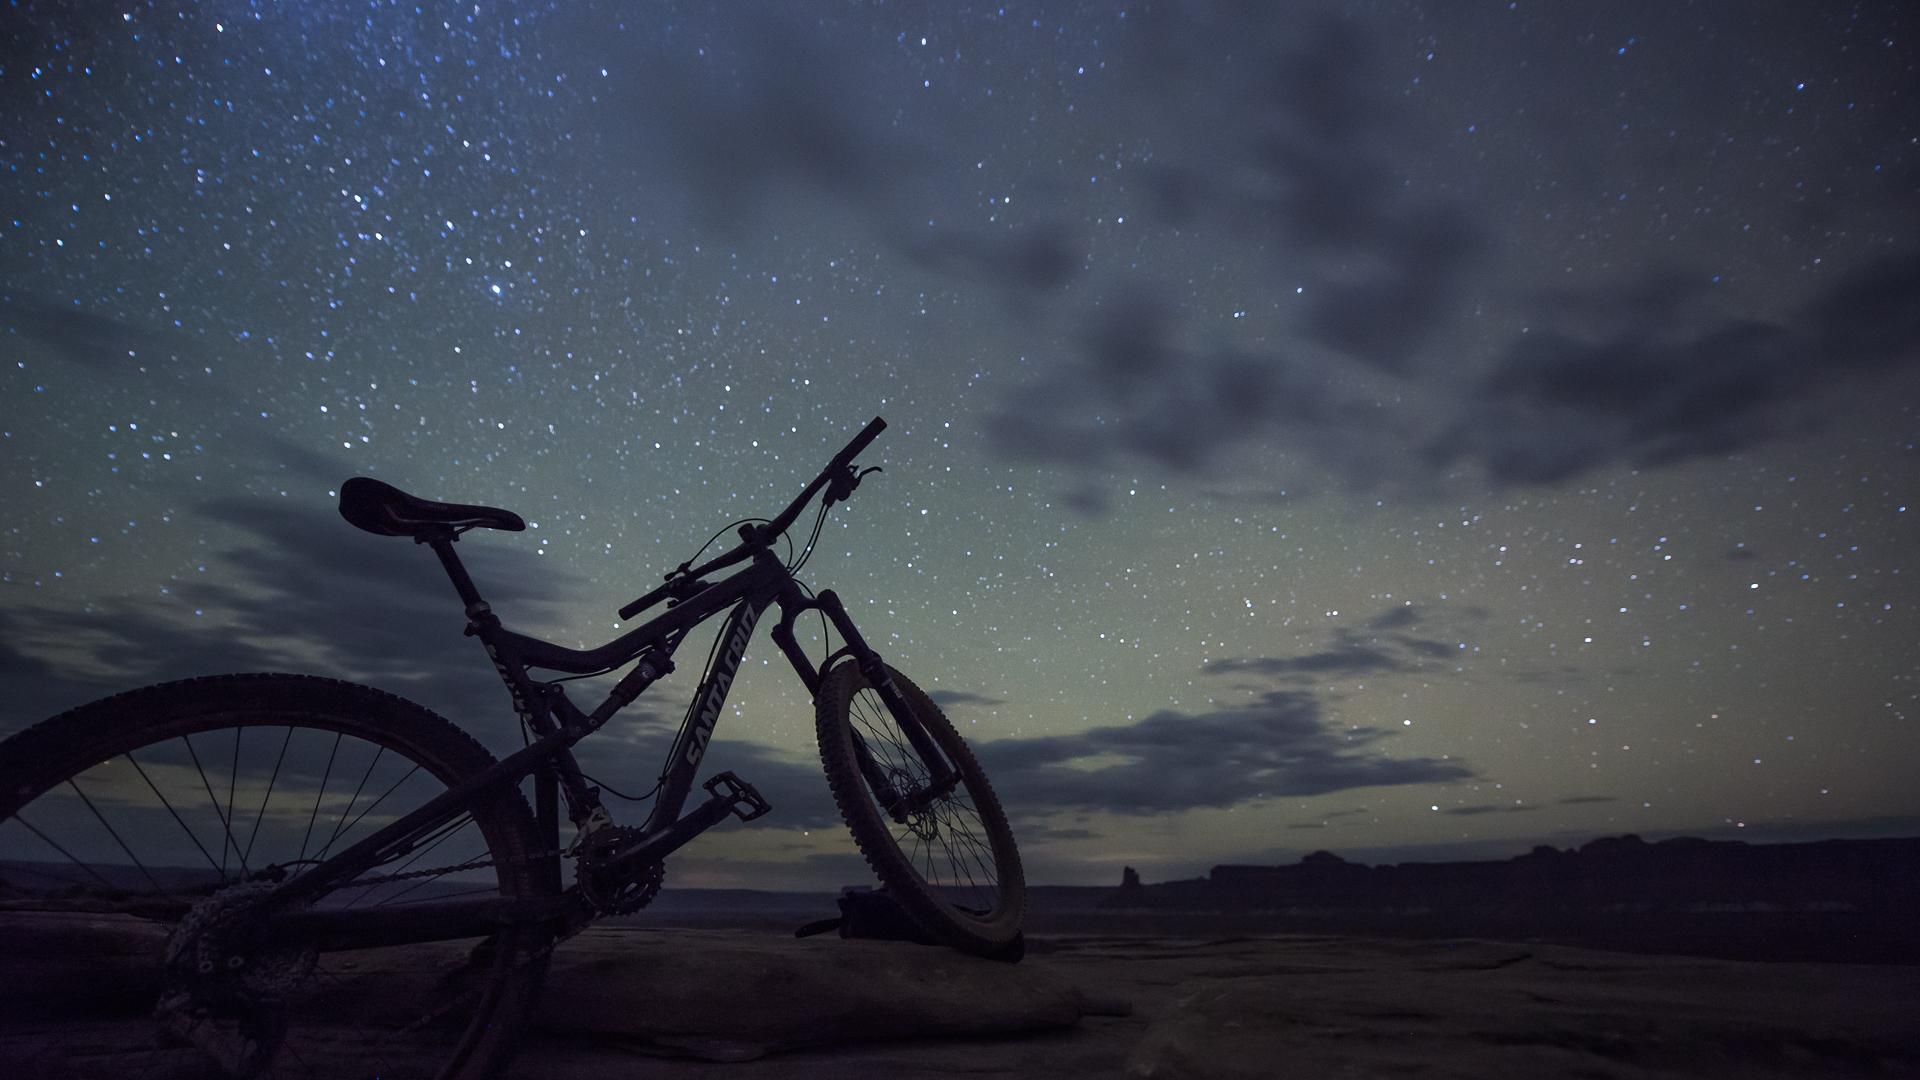 mountain bike starry nightscape